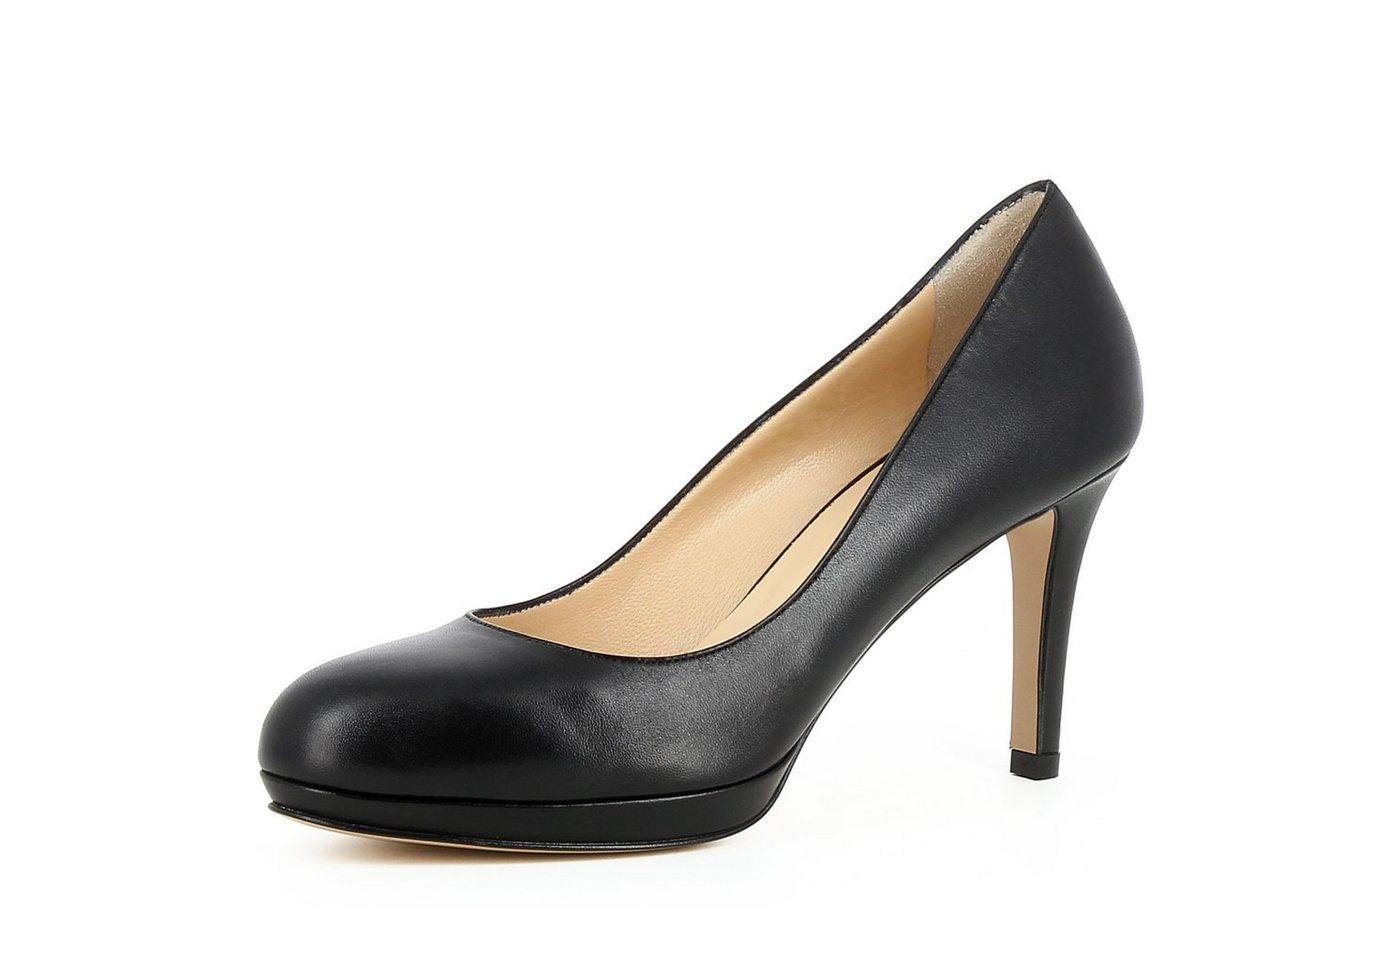 Evita »BIANCA« Plateaupumps | Schuhe > Pumps > Plateaupumps | Schwarz | Evita